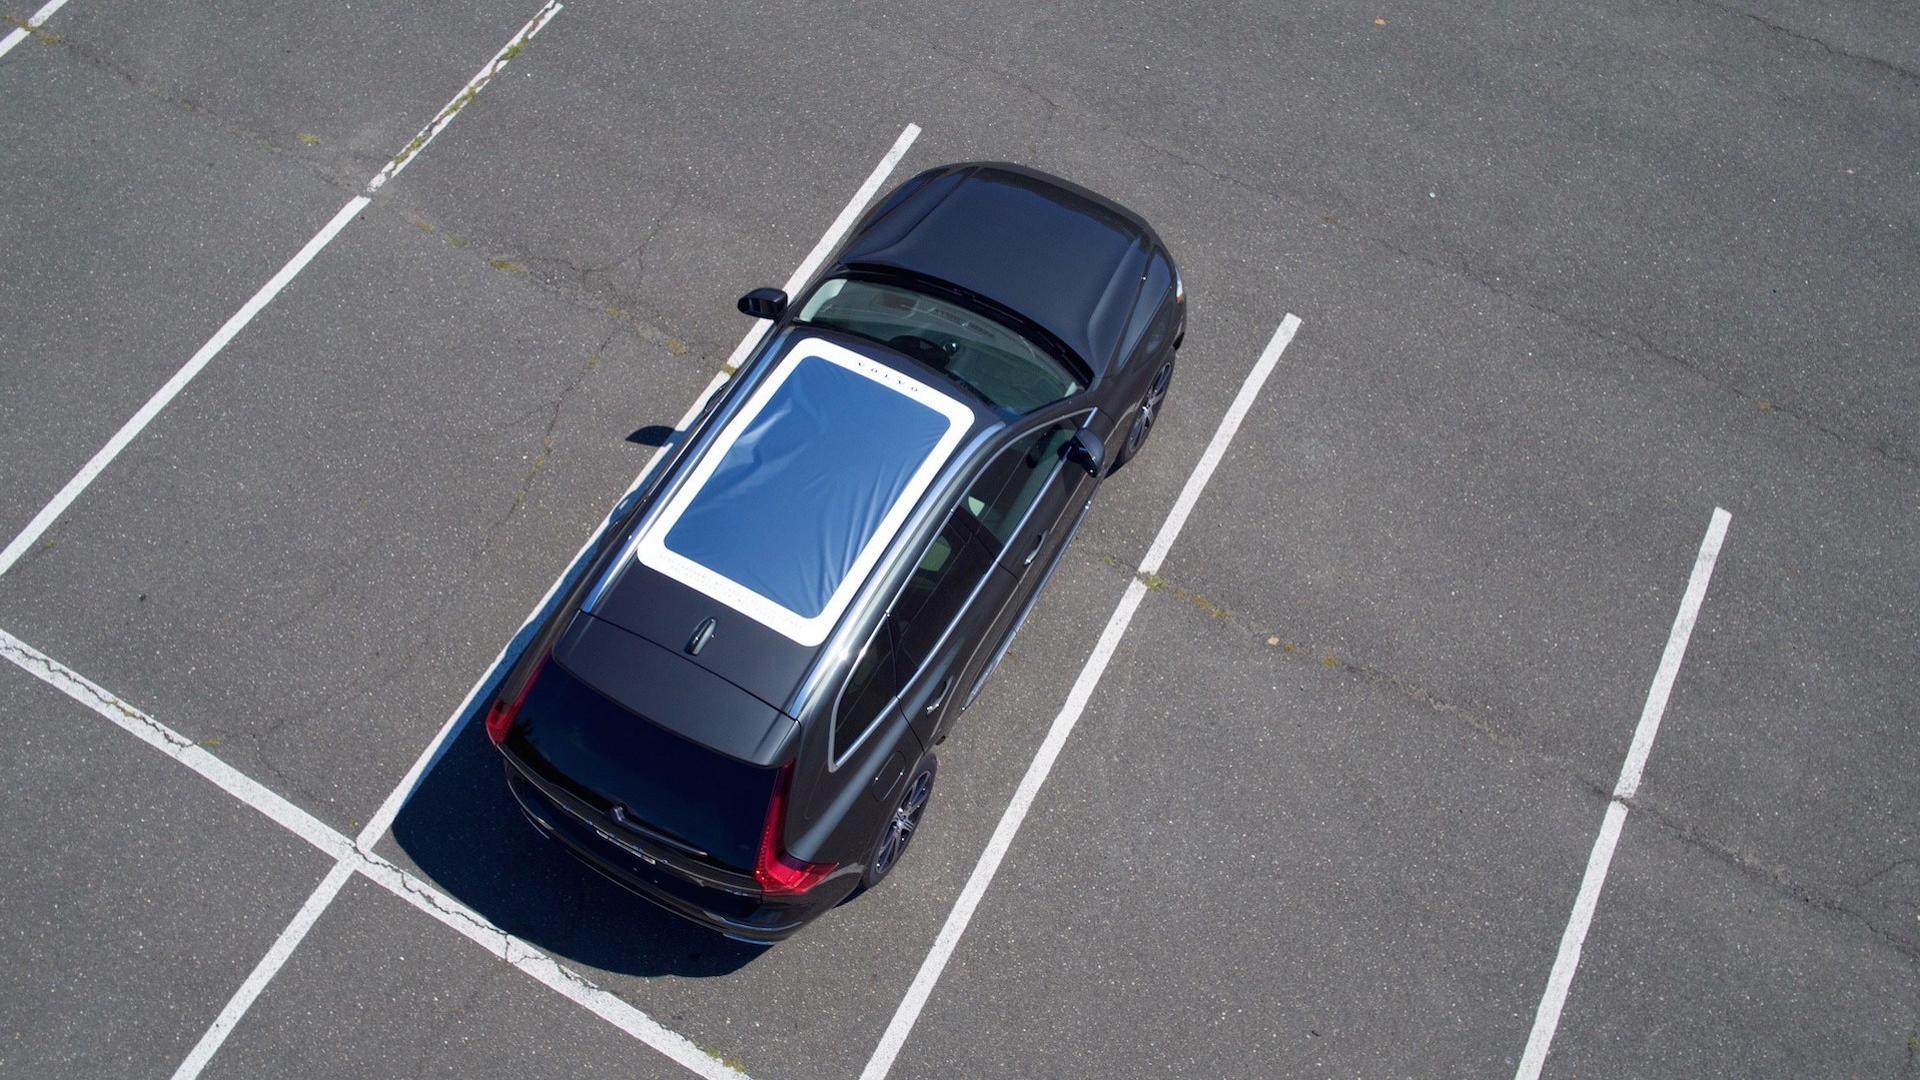 VWVortex Volvo creates custom solar eclipse viewer for the new